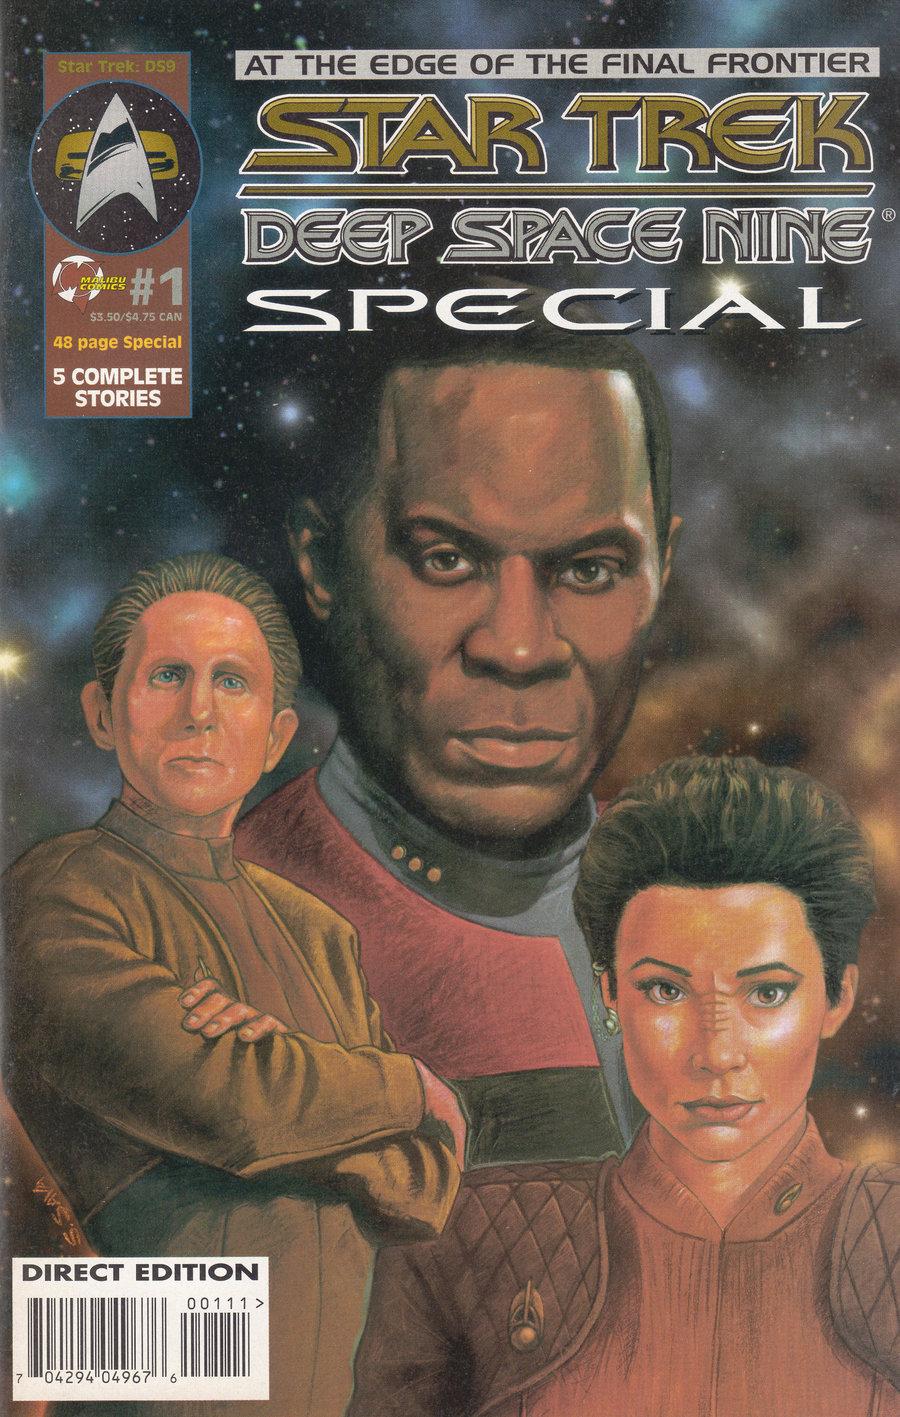 File:Malibu DS9 Special 1995.jpg